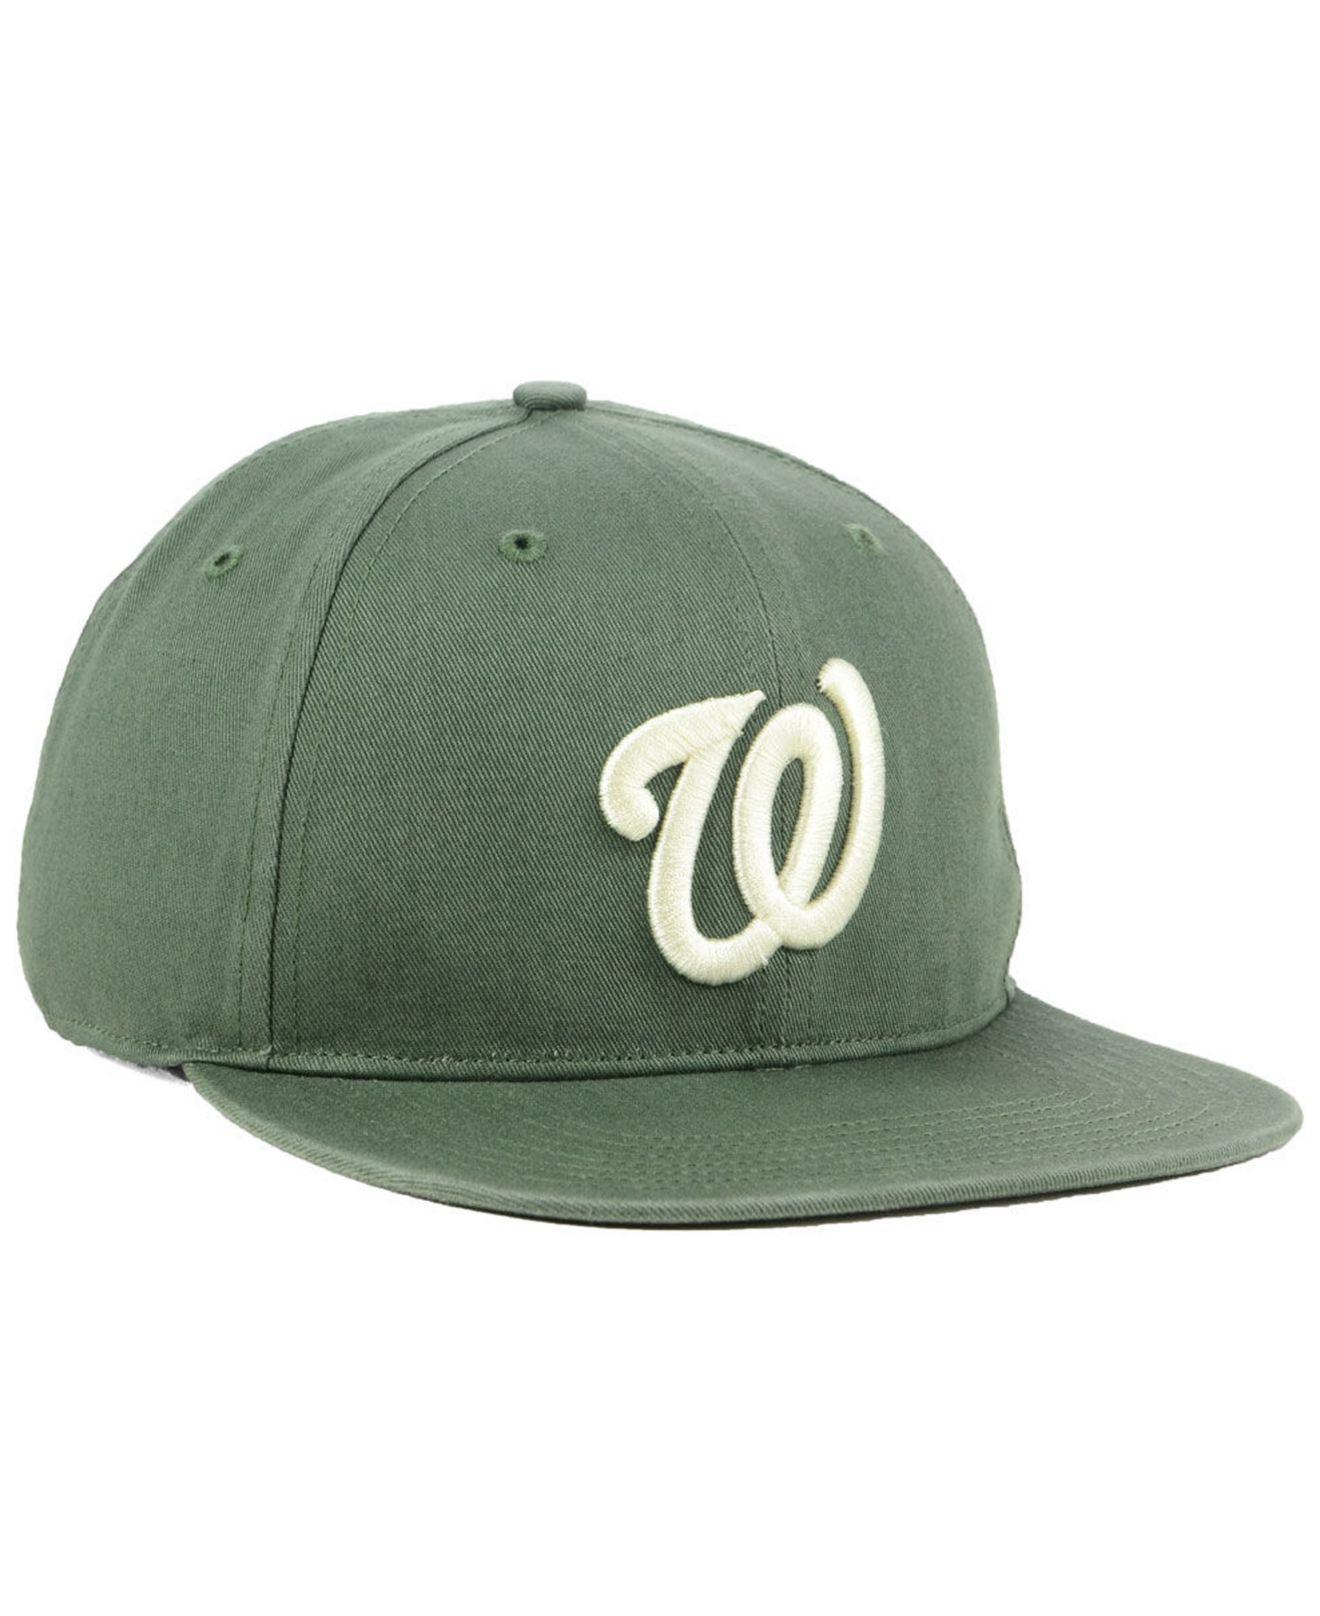 best website 8fdd4 51a2d ... promo code for 47 brand green washington nationals moss snapback cap  for men lyst. view